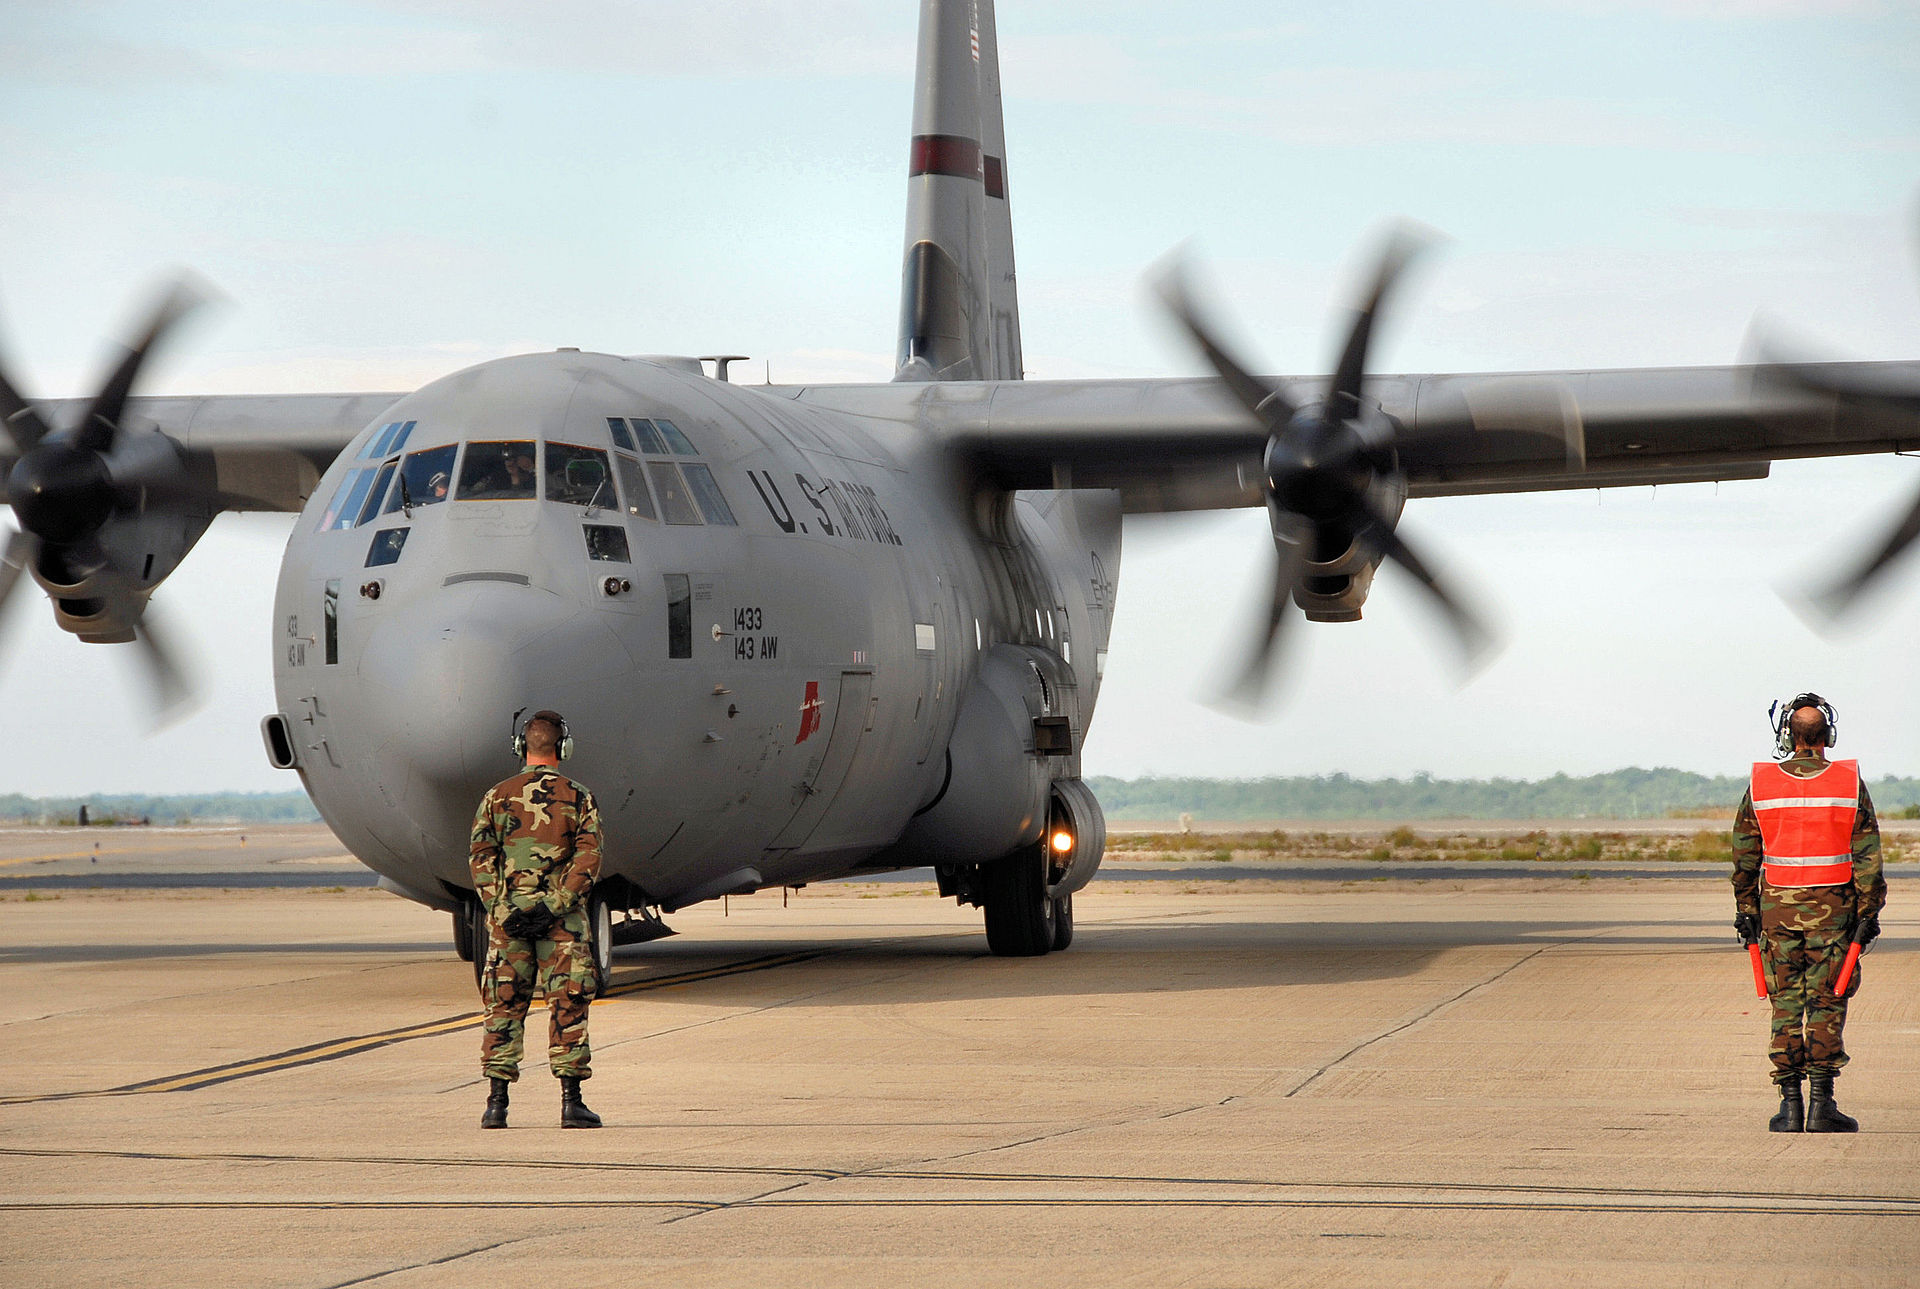 Rhode Island Air National Guard Providence Journal